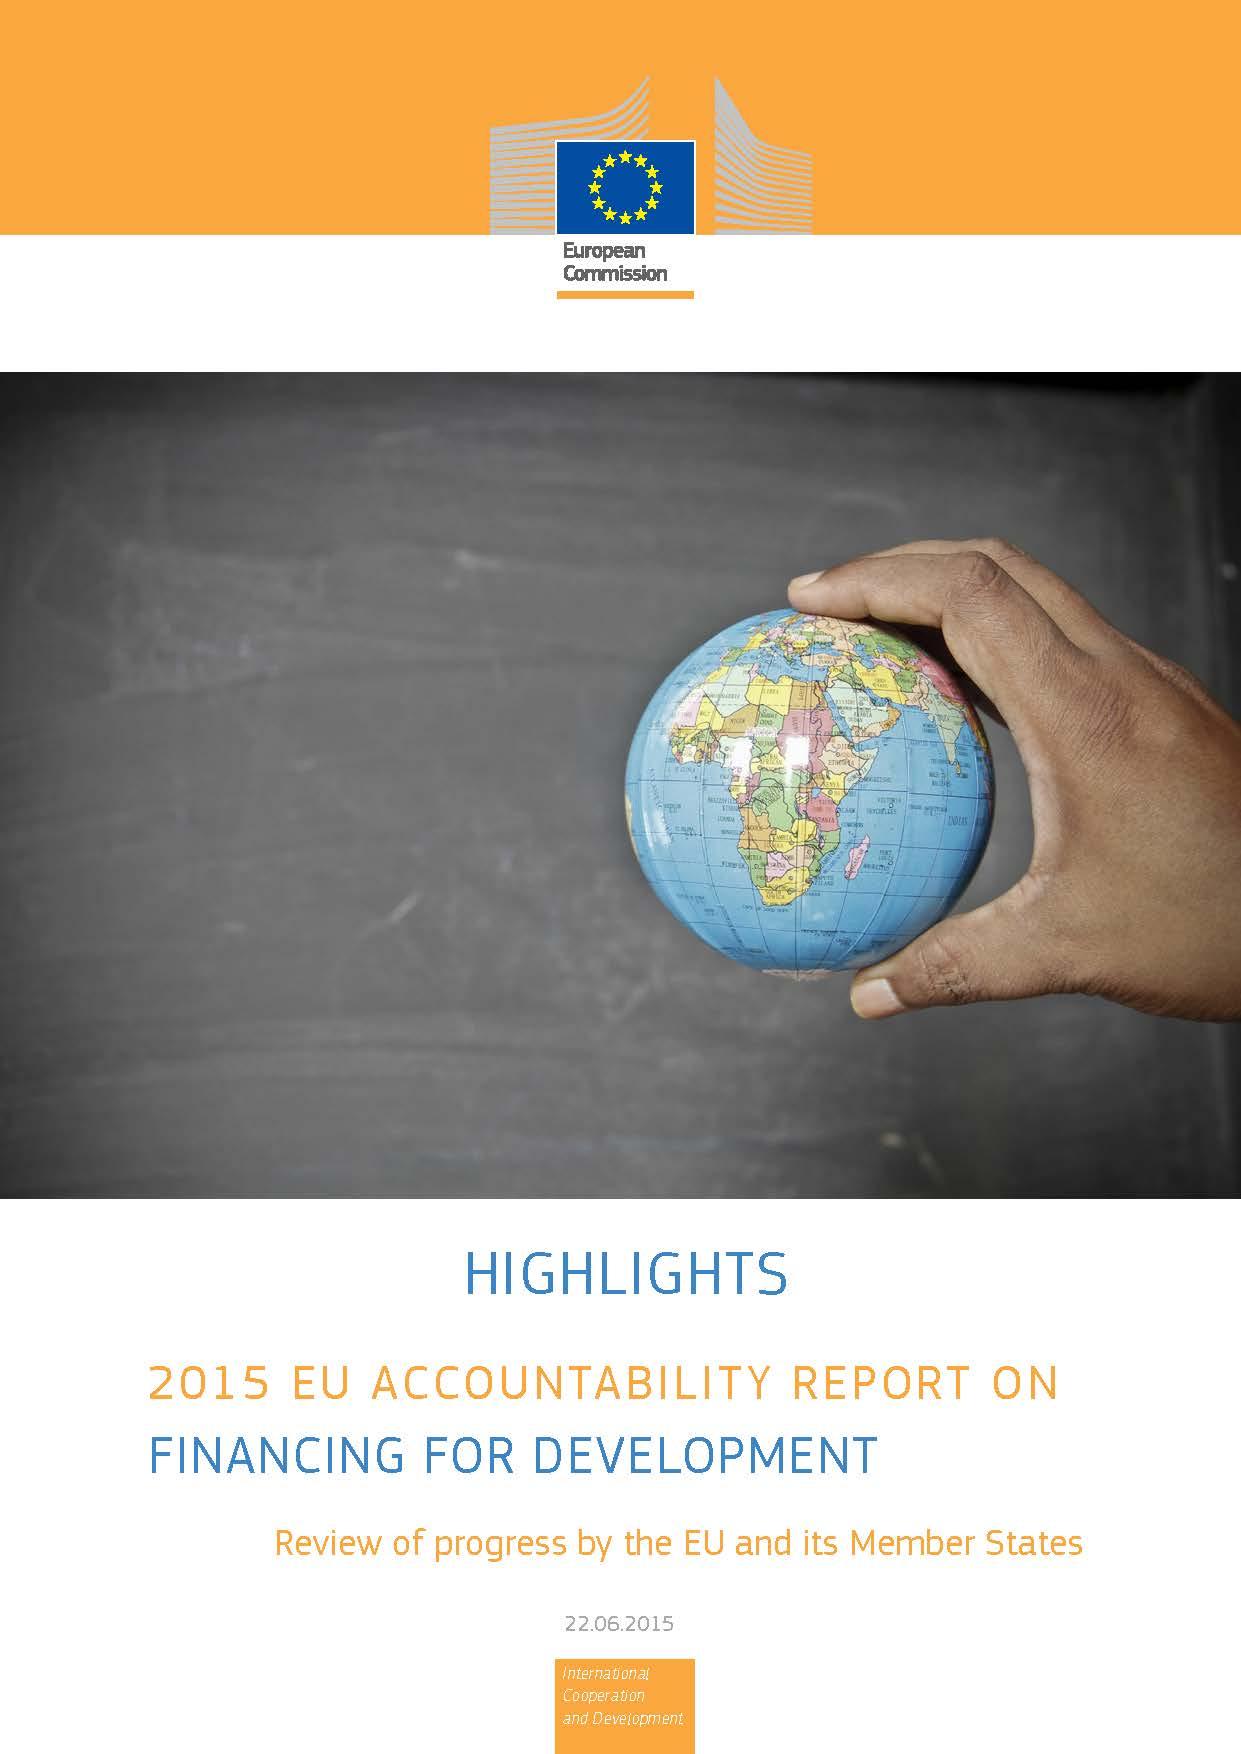 eu-financing-for-development-ality-report-2015-highlights_en 1.jpg